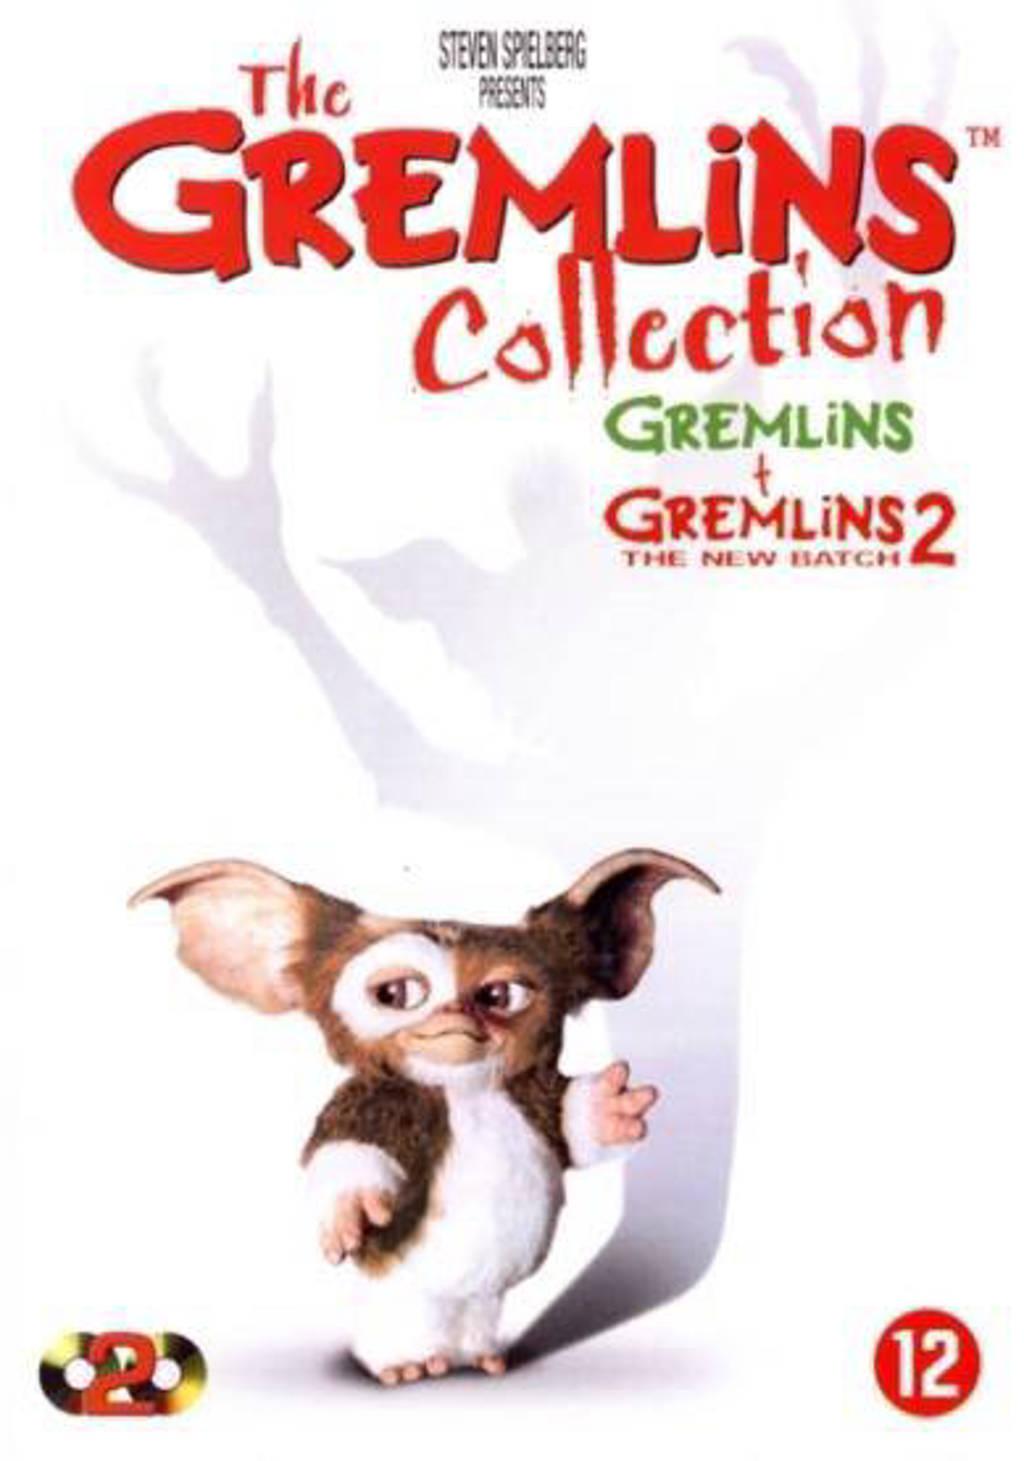 Gremlins collection (DVD)